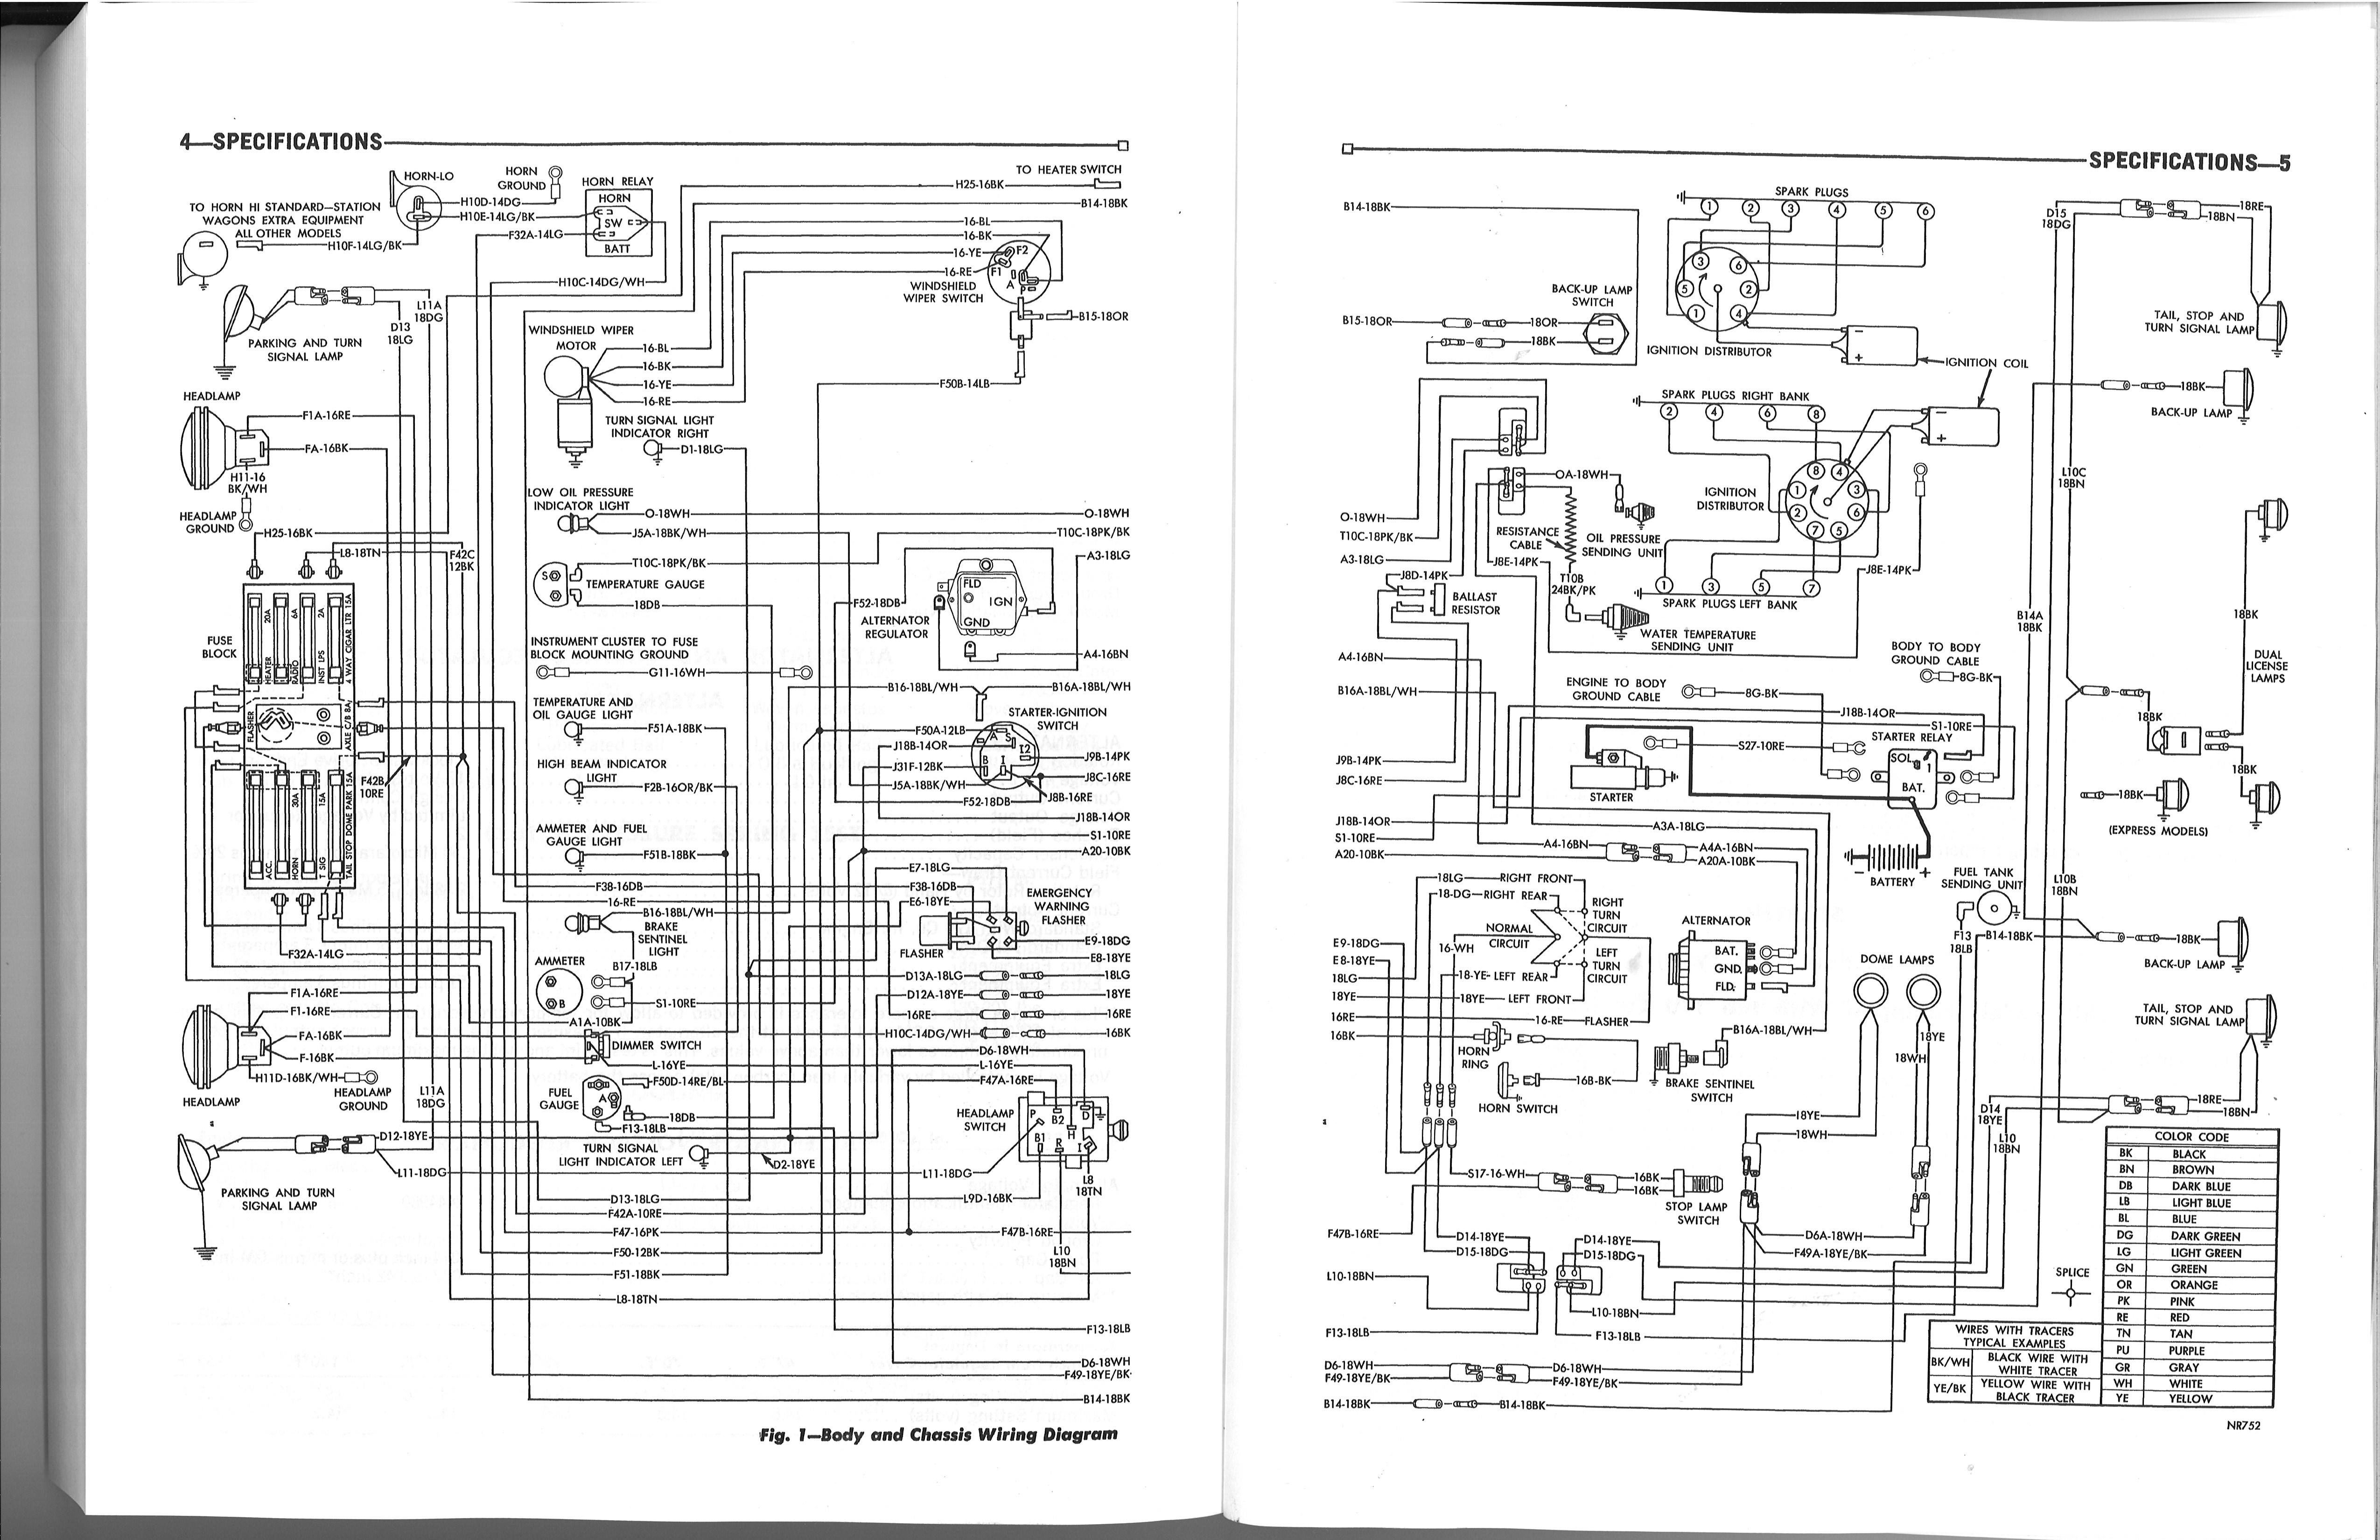 1972 Chrysler Newport Wiring Diagram Automotive Diagrams 1979 Vw Wiring Harness For Wiring Diagram Schematics